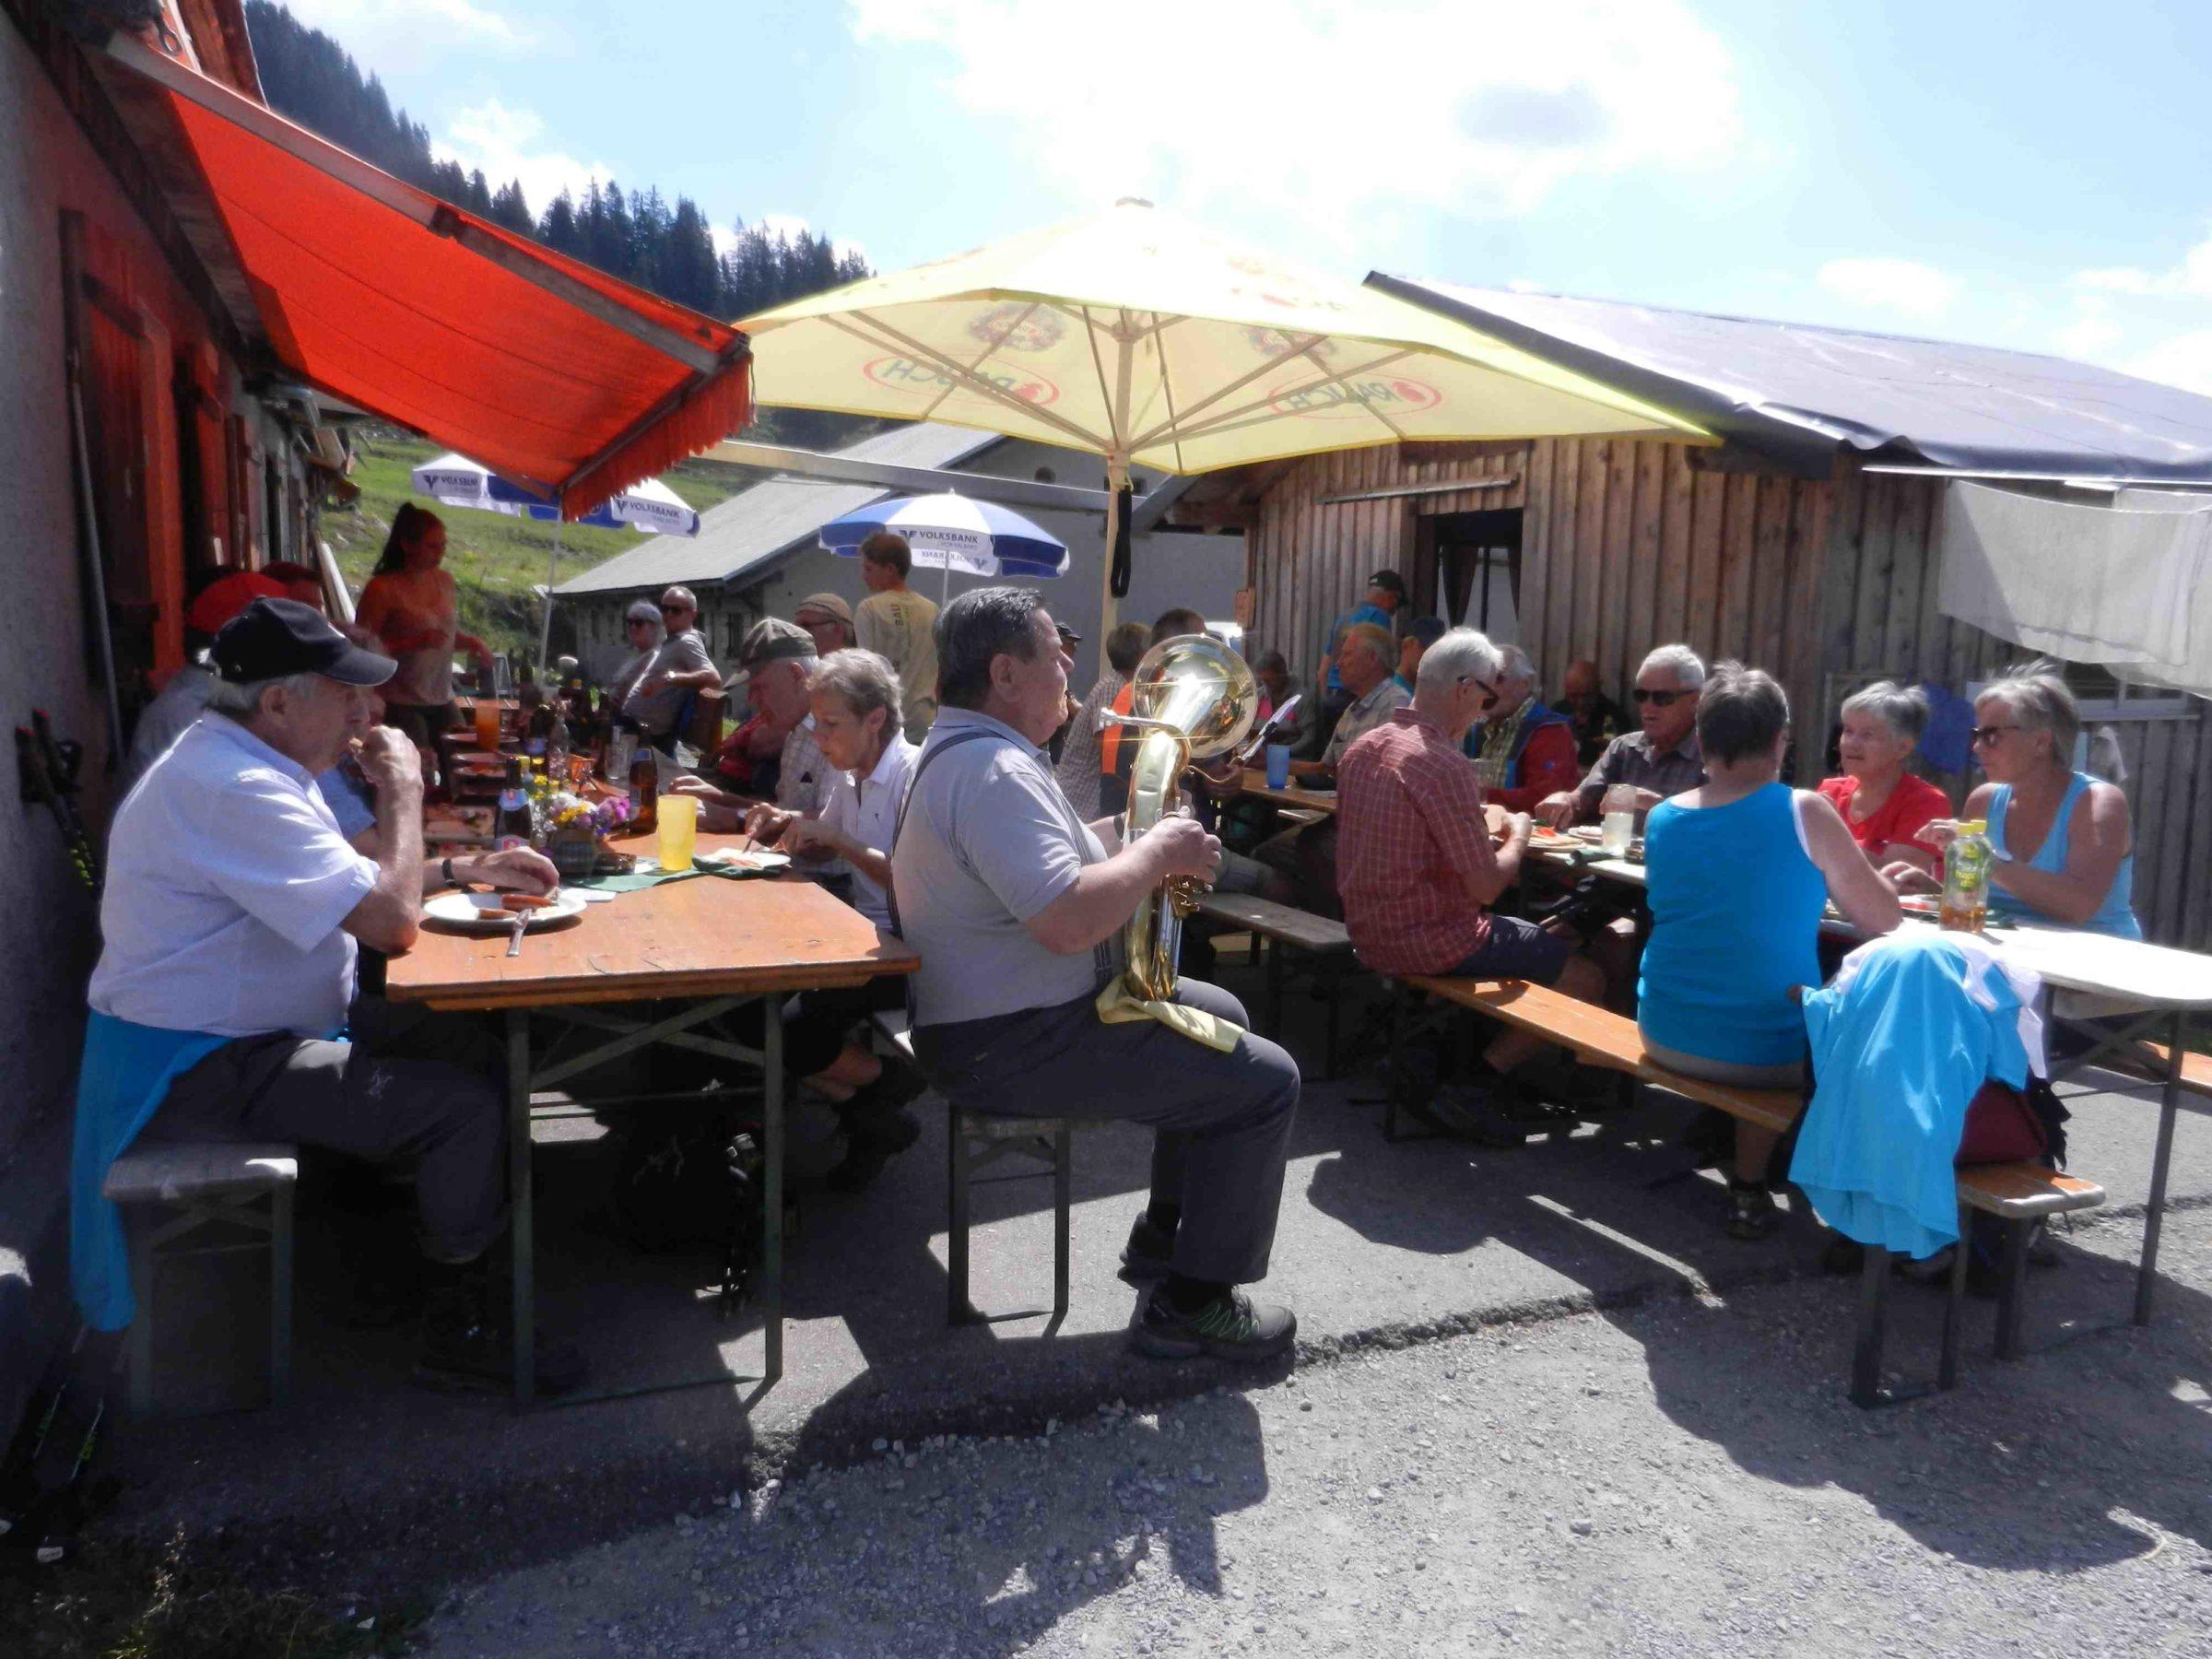 Wandertag zur Alpe Saluver im Laternsertal am 20.7.2018